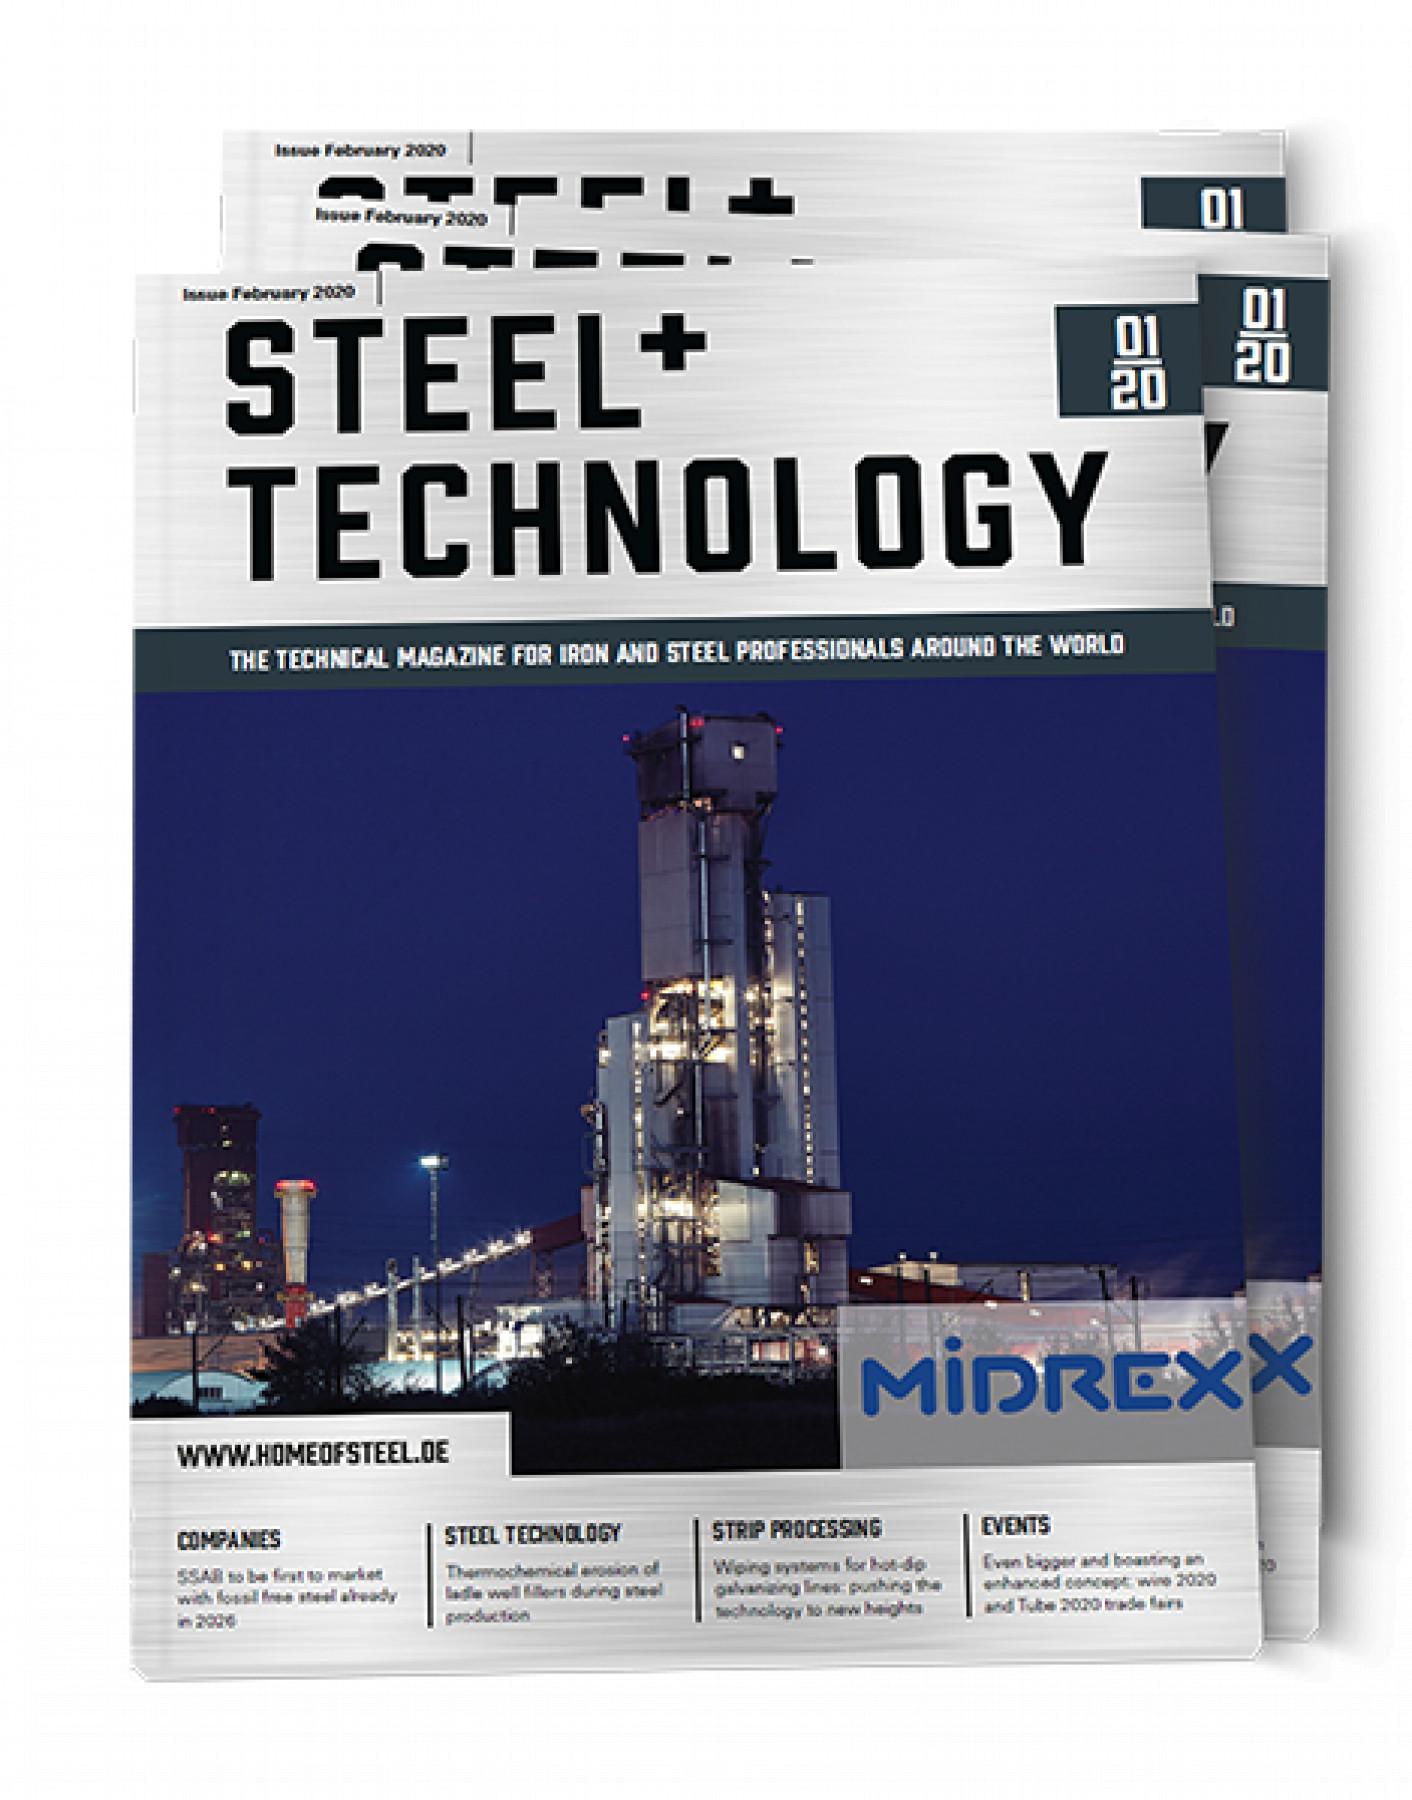 STEEL+TECHNOLOGY   Home of Steel